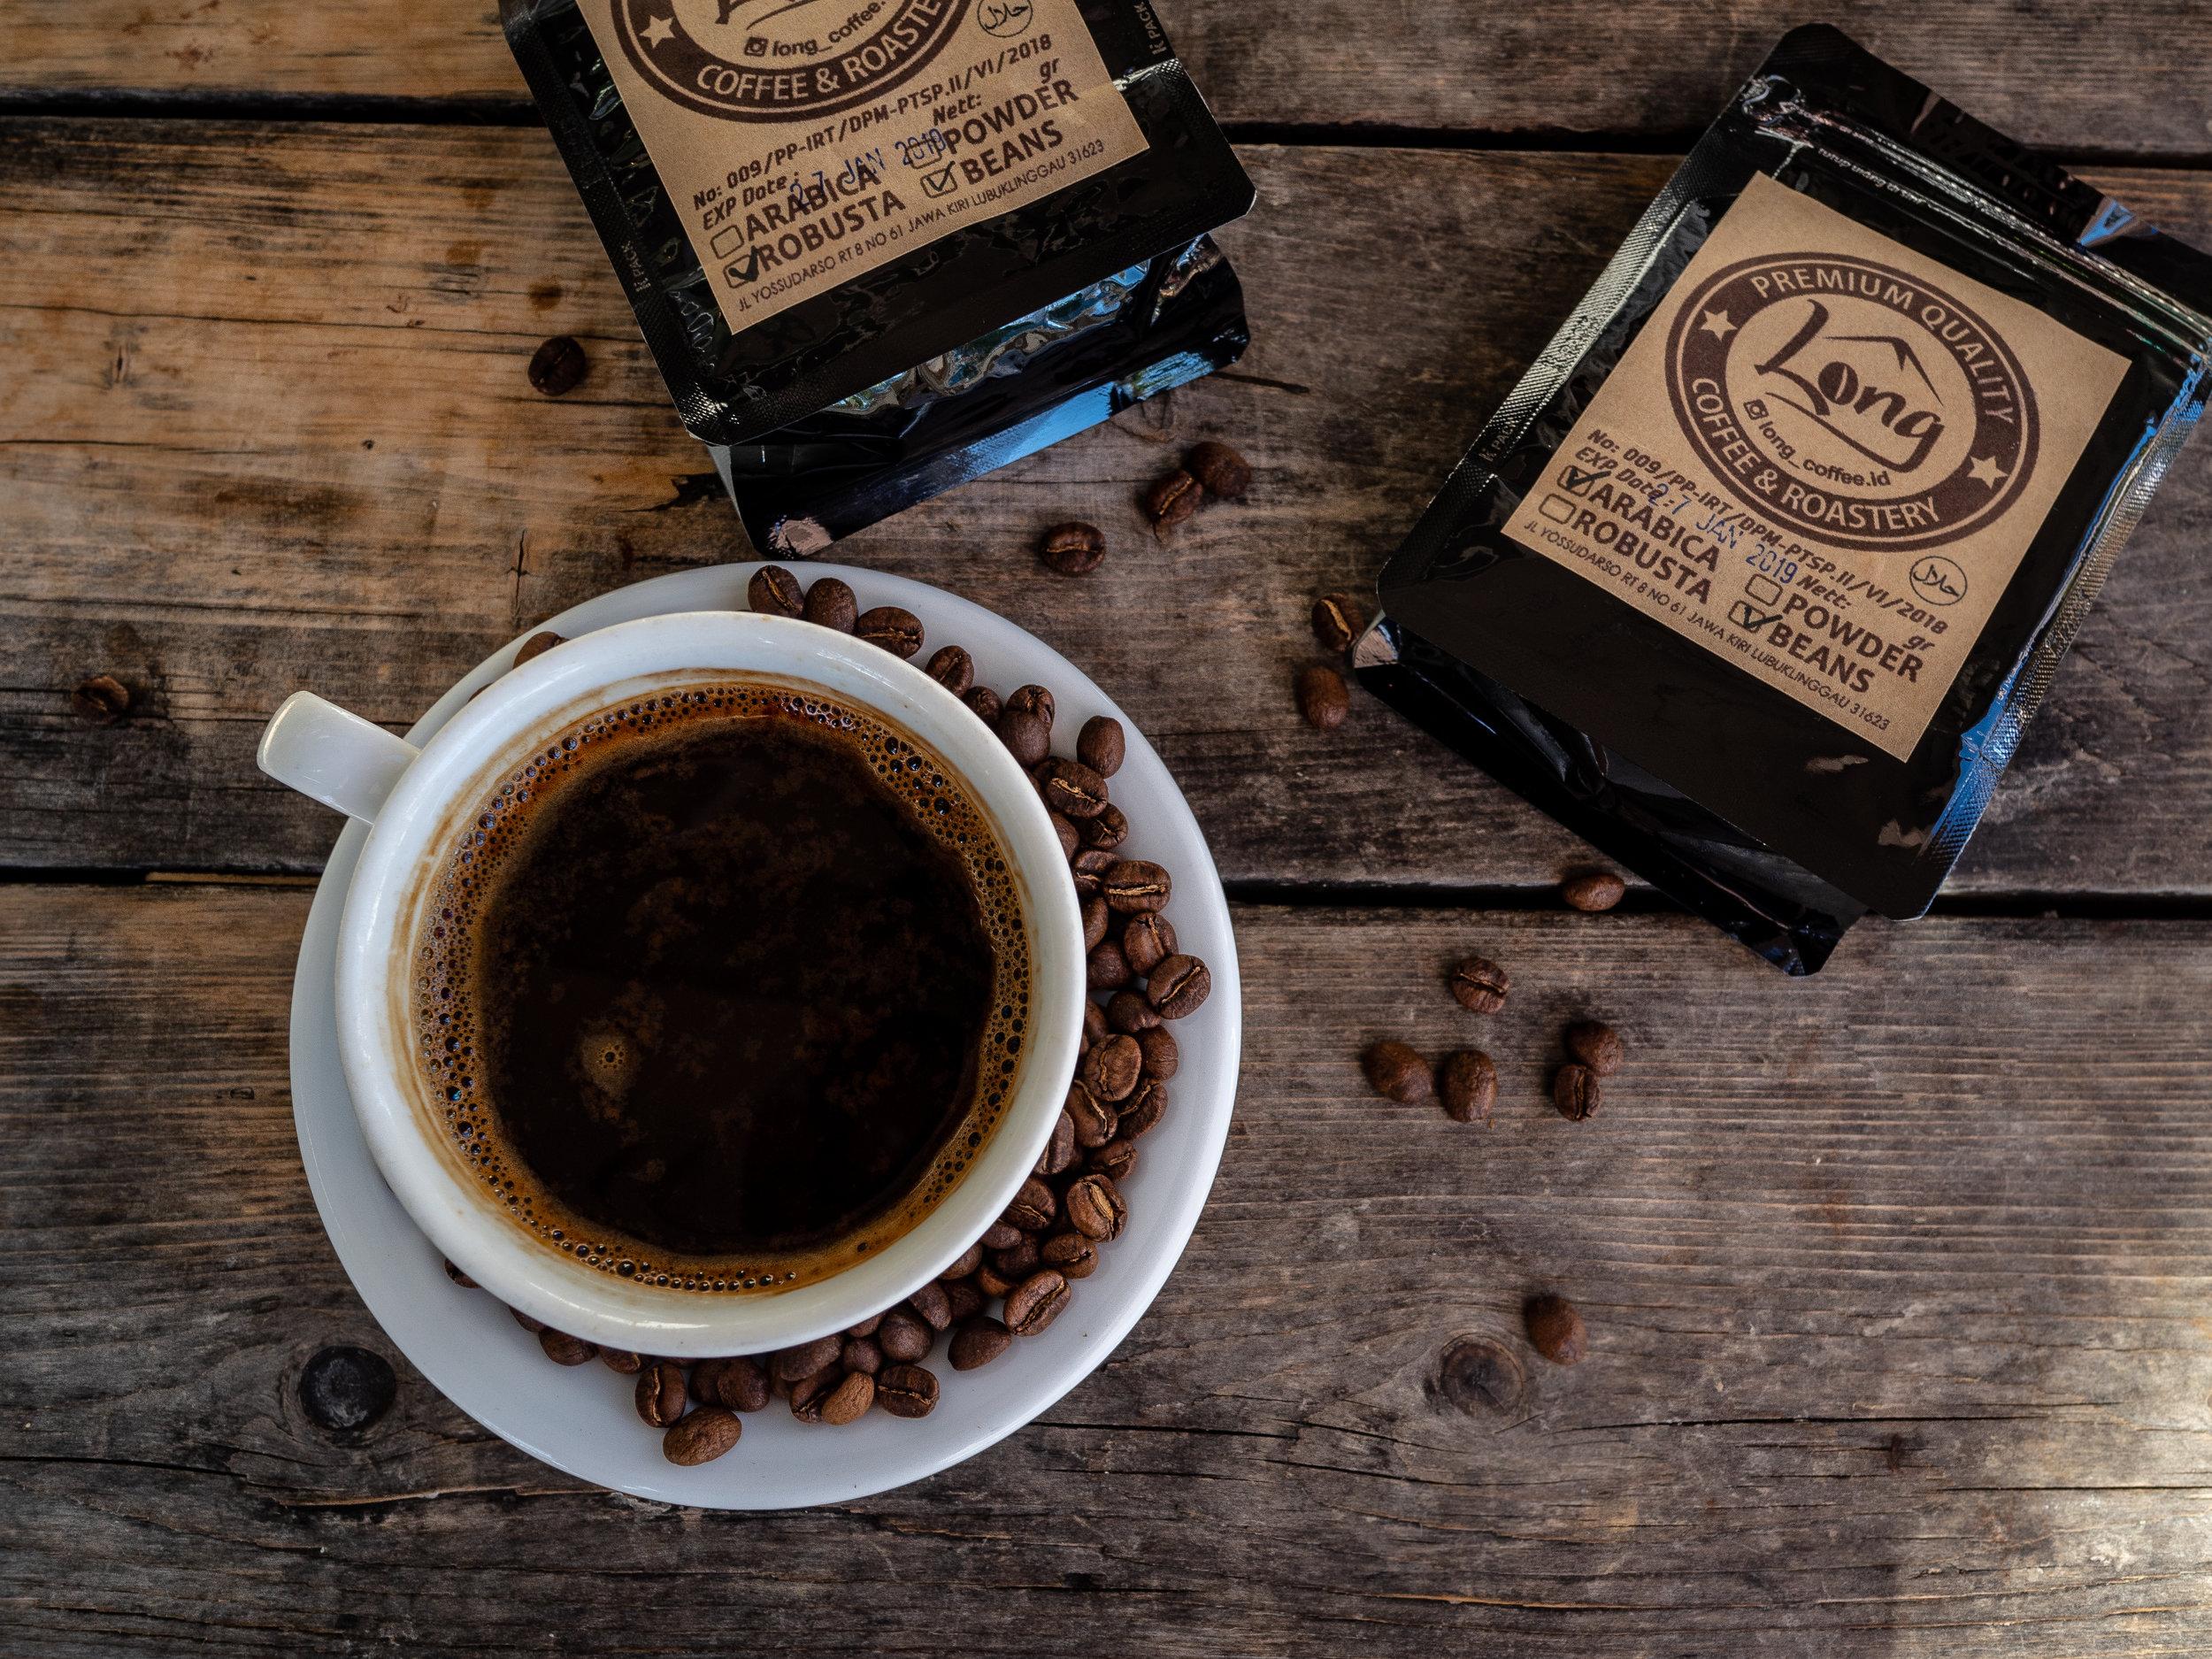 Musings by the Glass - Caffeinated Caravan - Long Coffee & Roastery